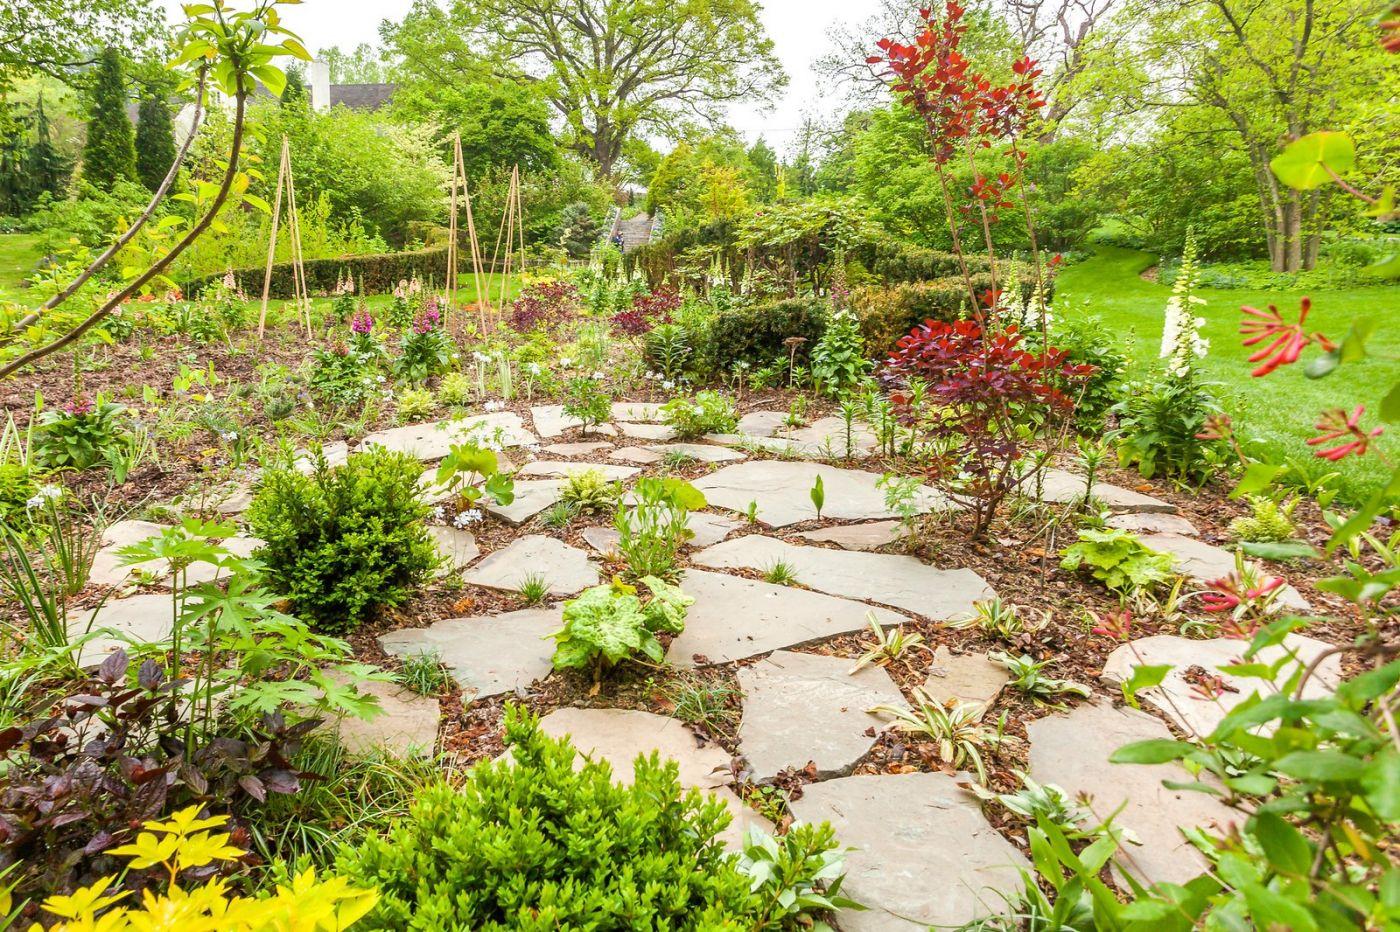 Chanticleer花园,融入自然_图1-18